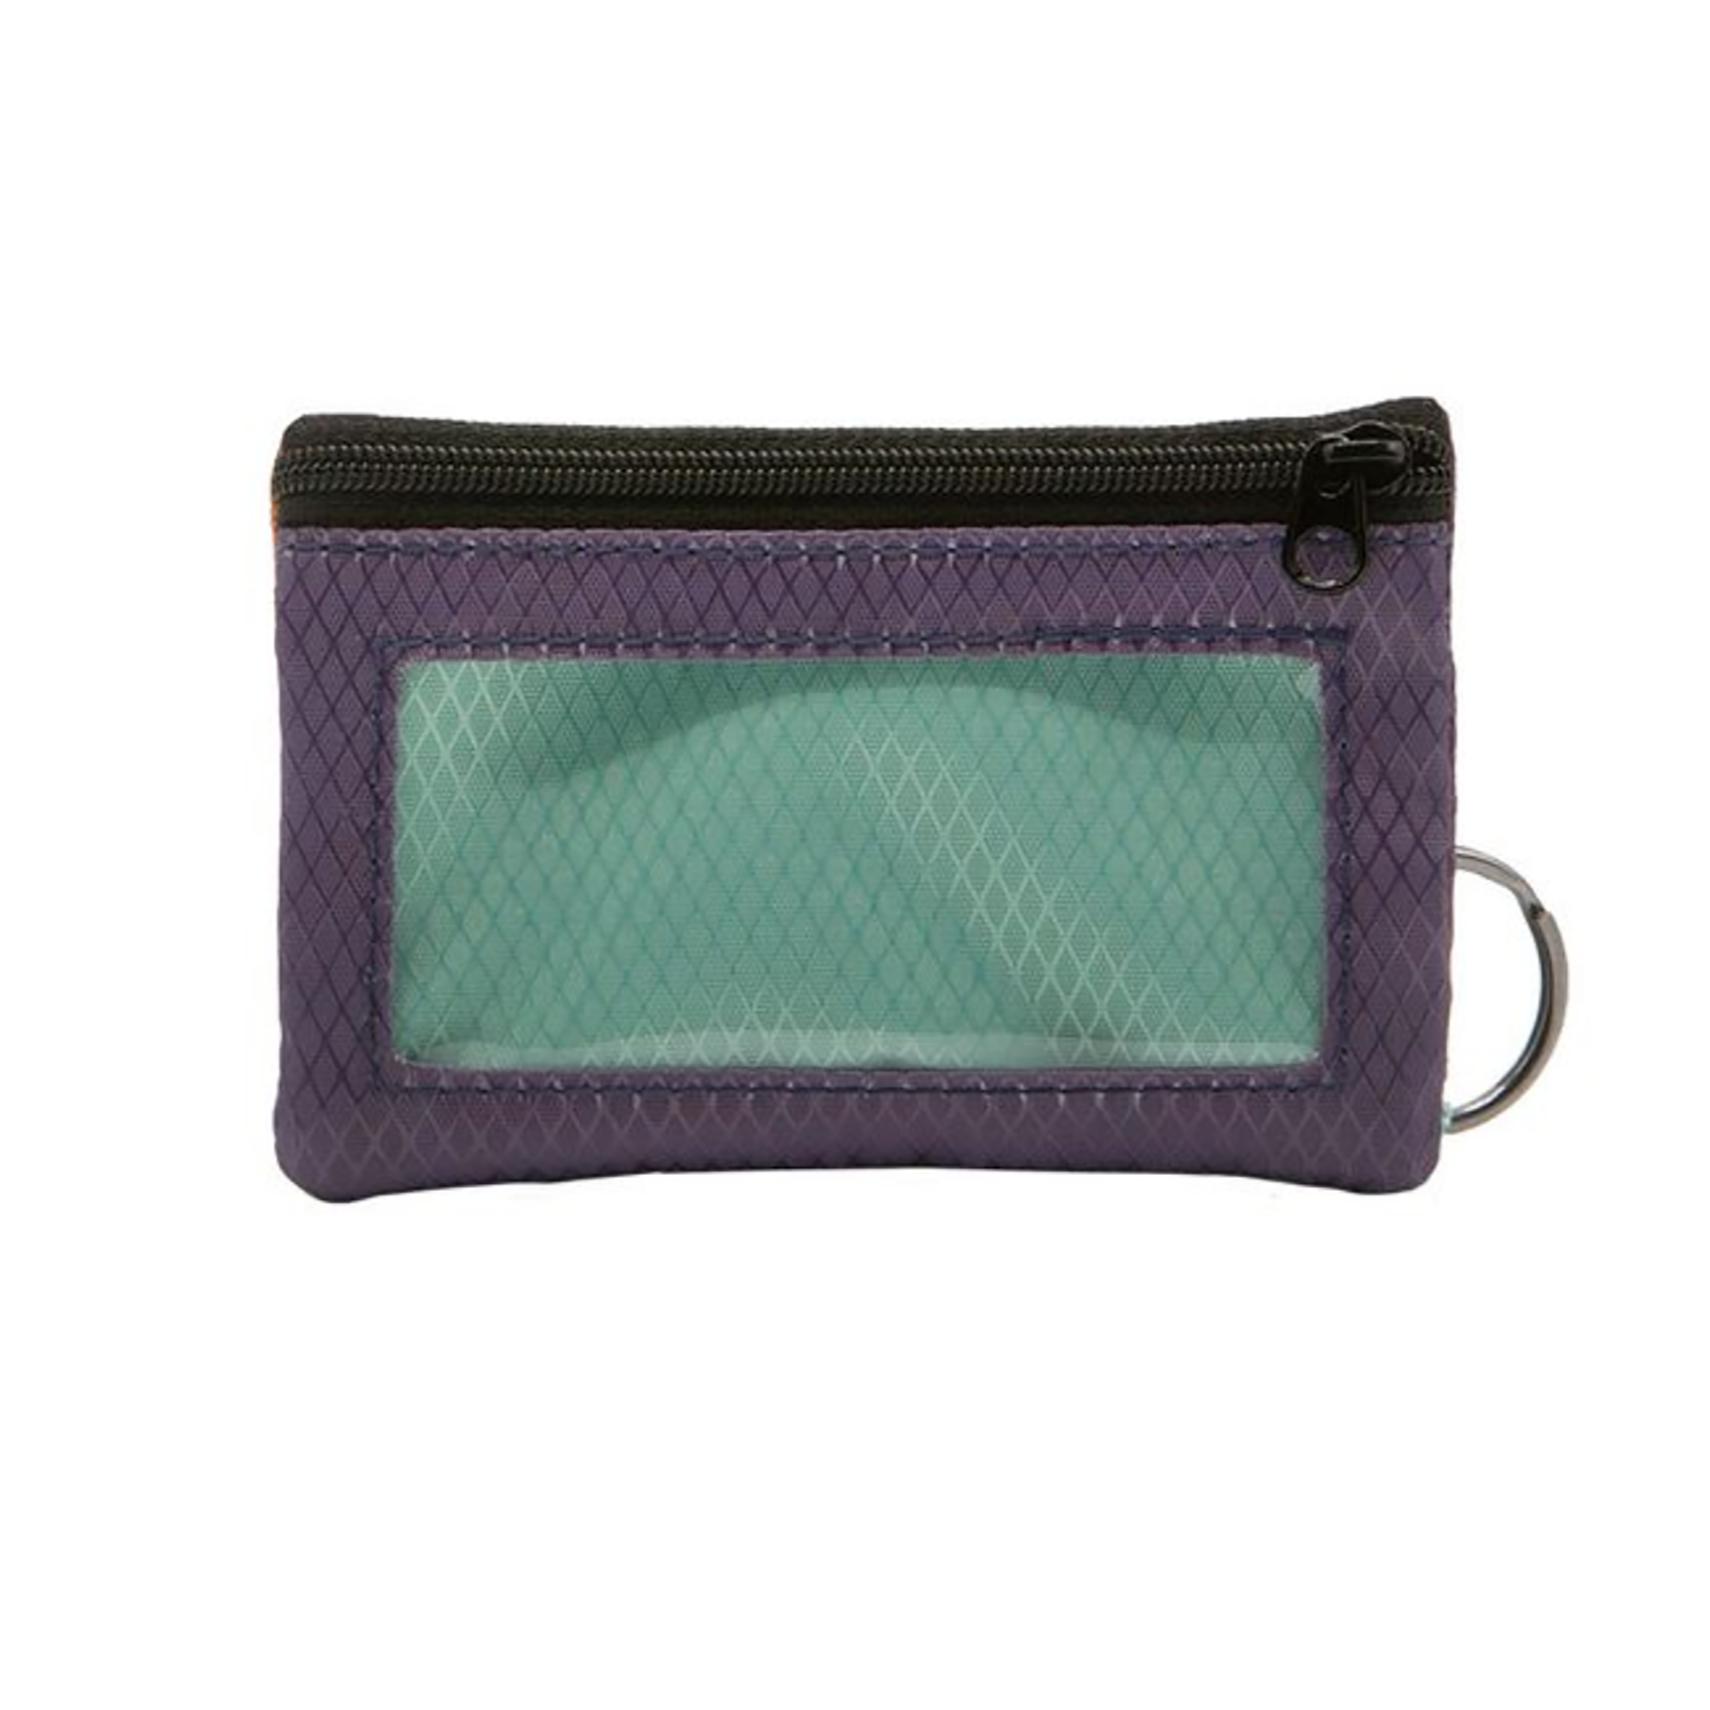 Surfshorts Wallet Tri-color, Assorted-2